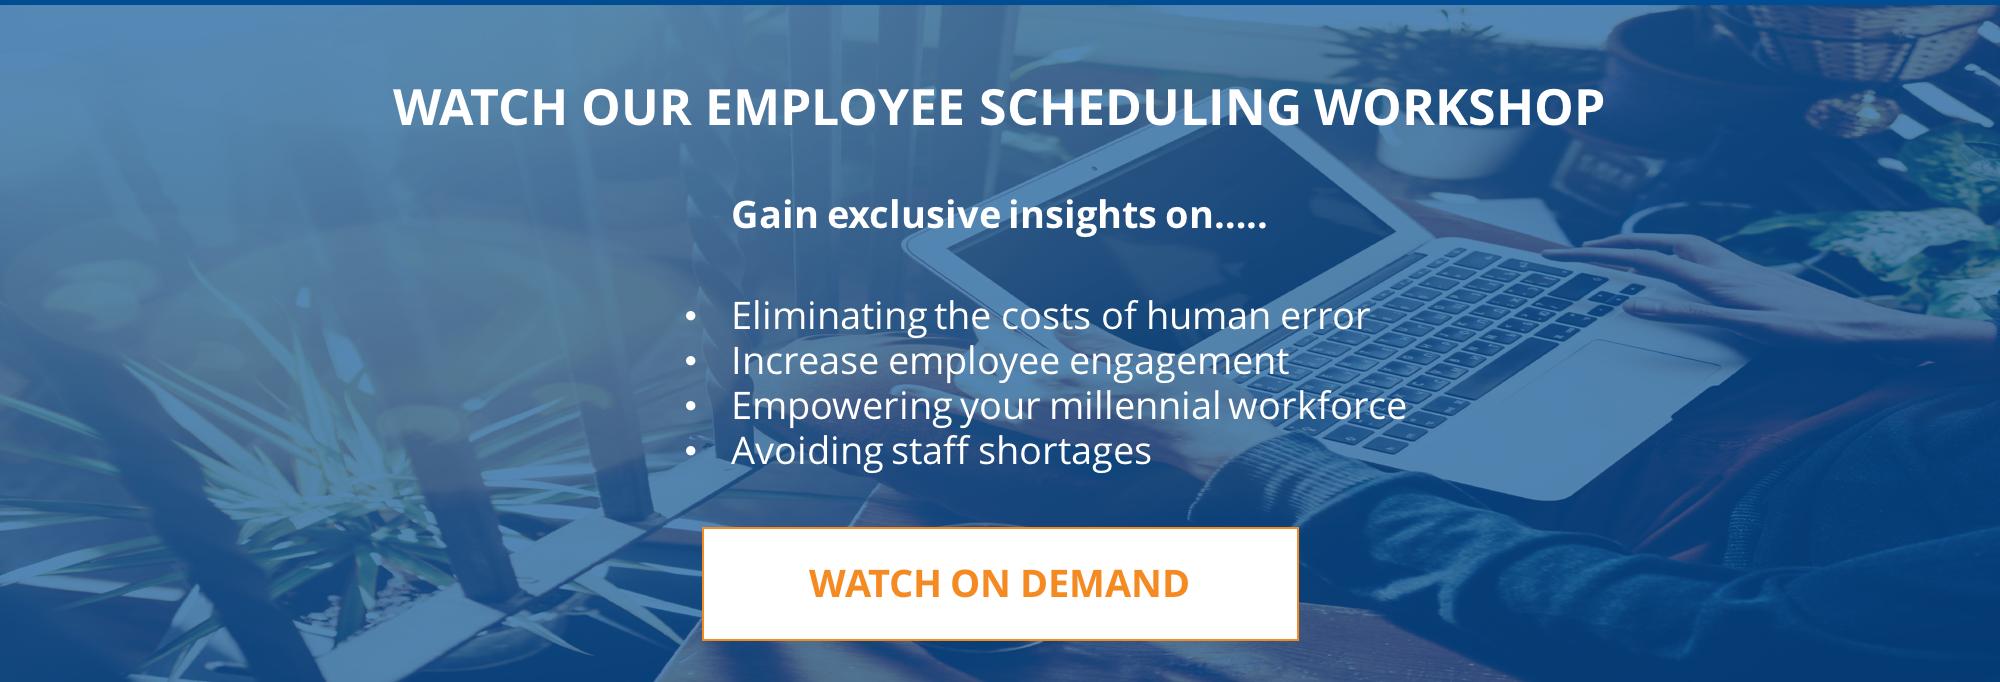 Watch our employee scheduling workshop.